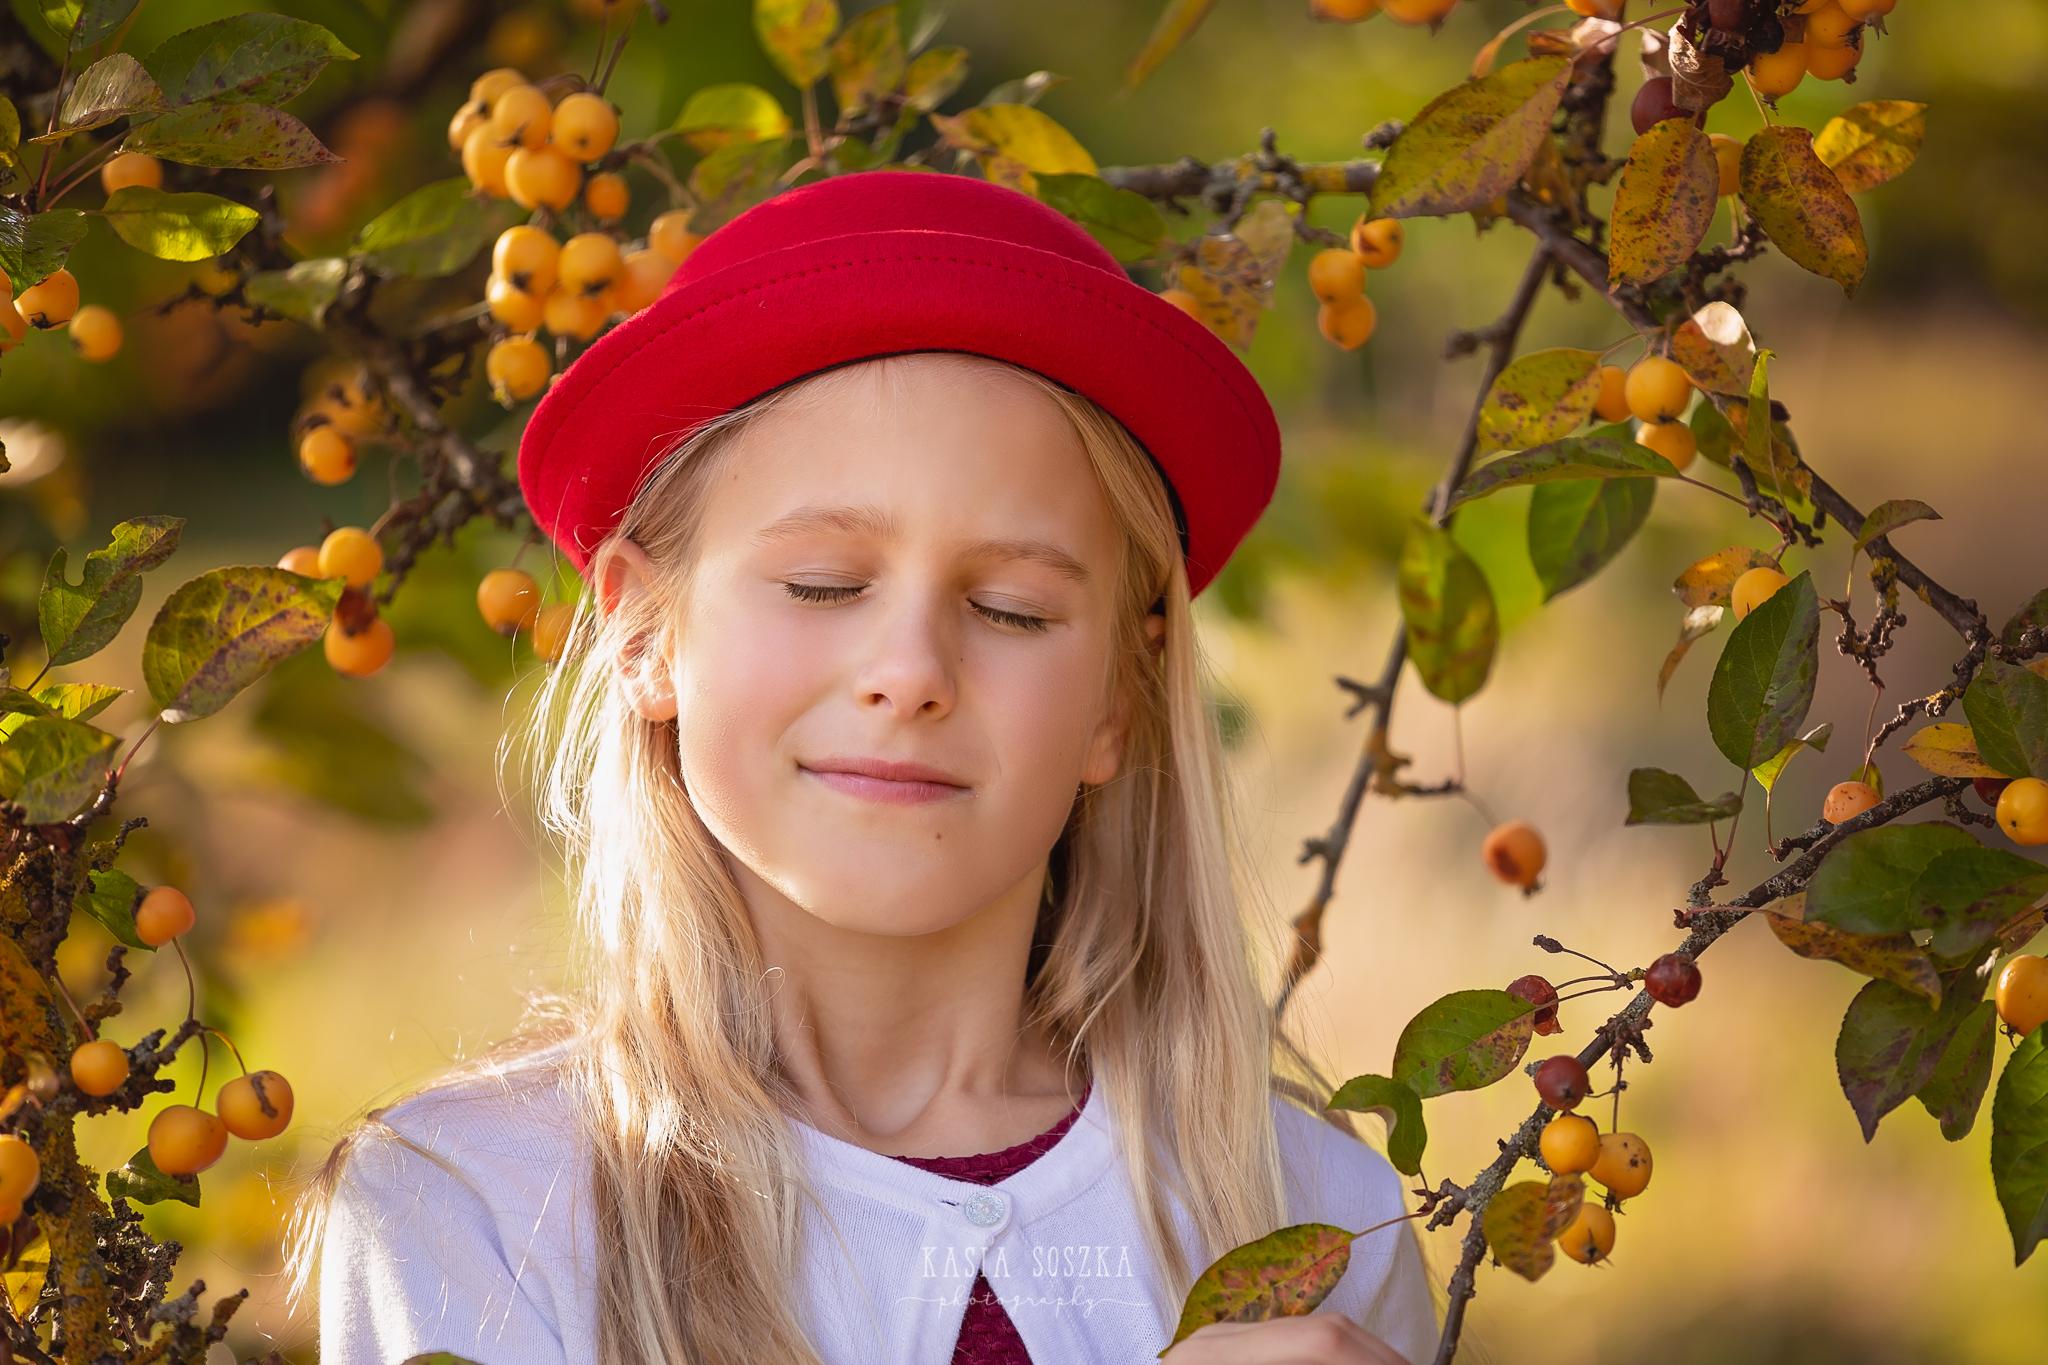 Children photography, child photographer Leeds, York, Bradford, Harrogate: pretty blond girl under yellow berry tree